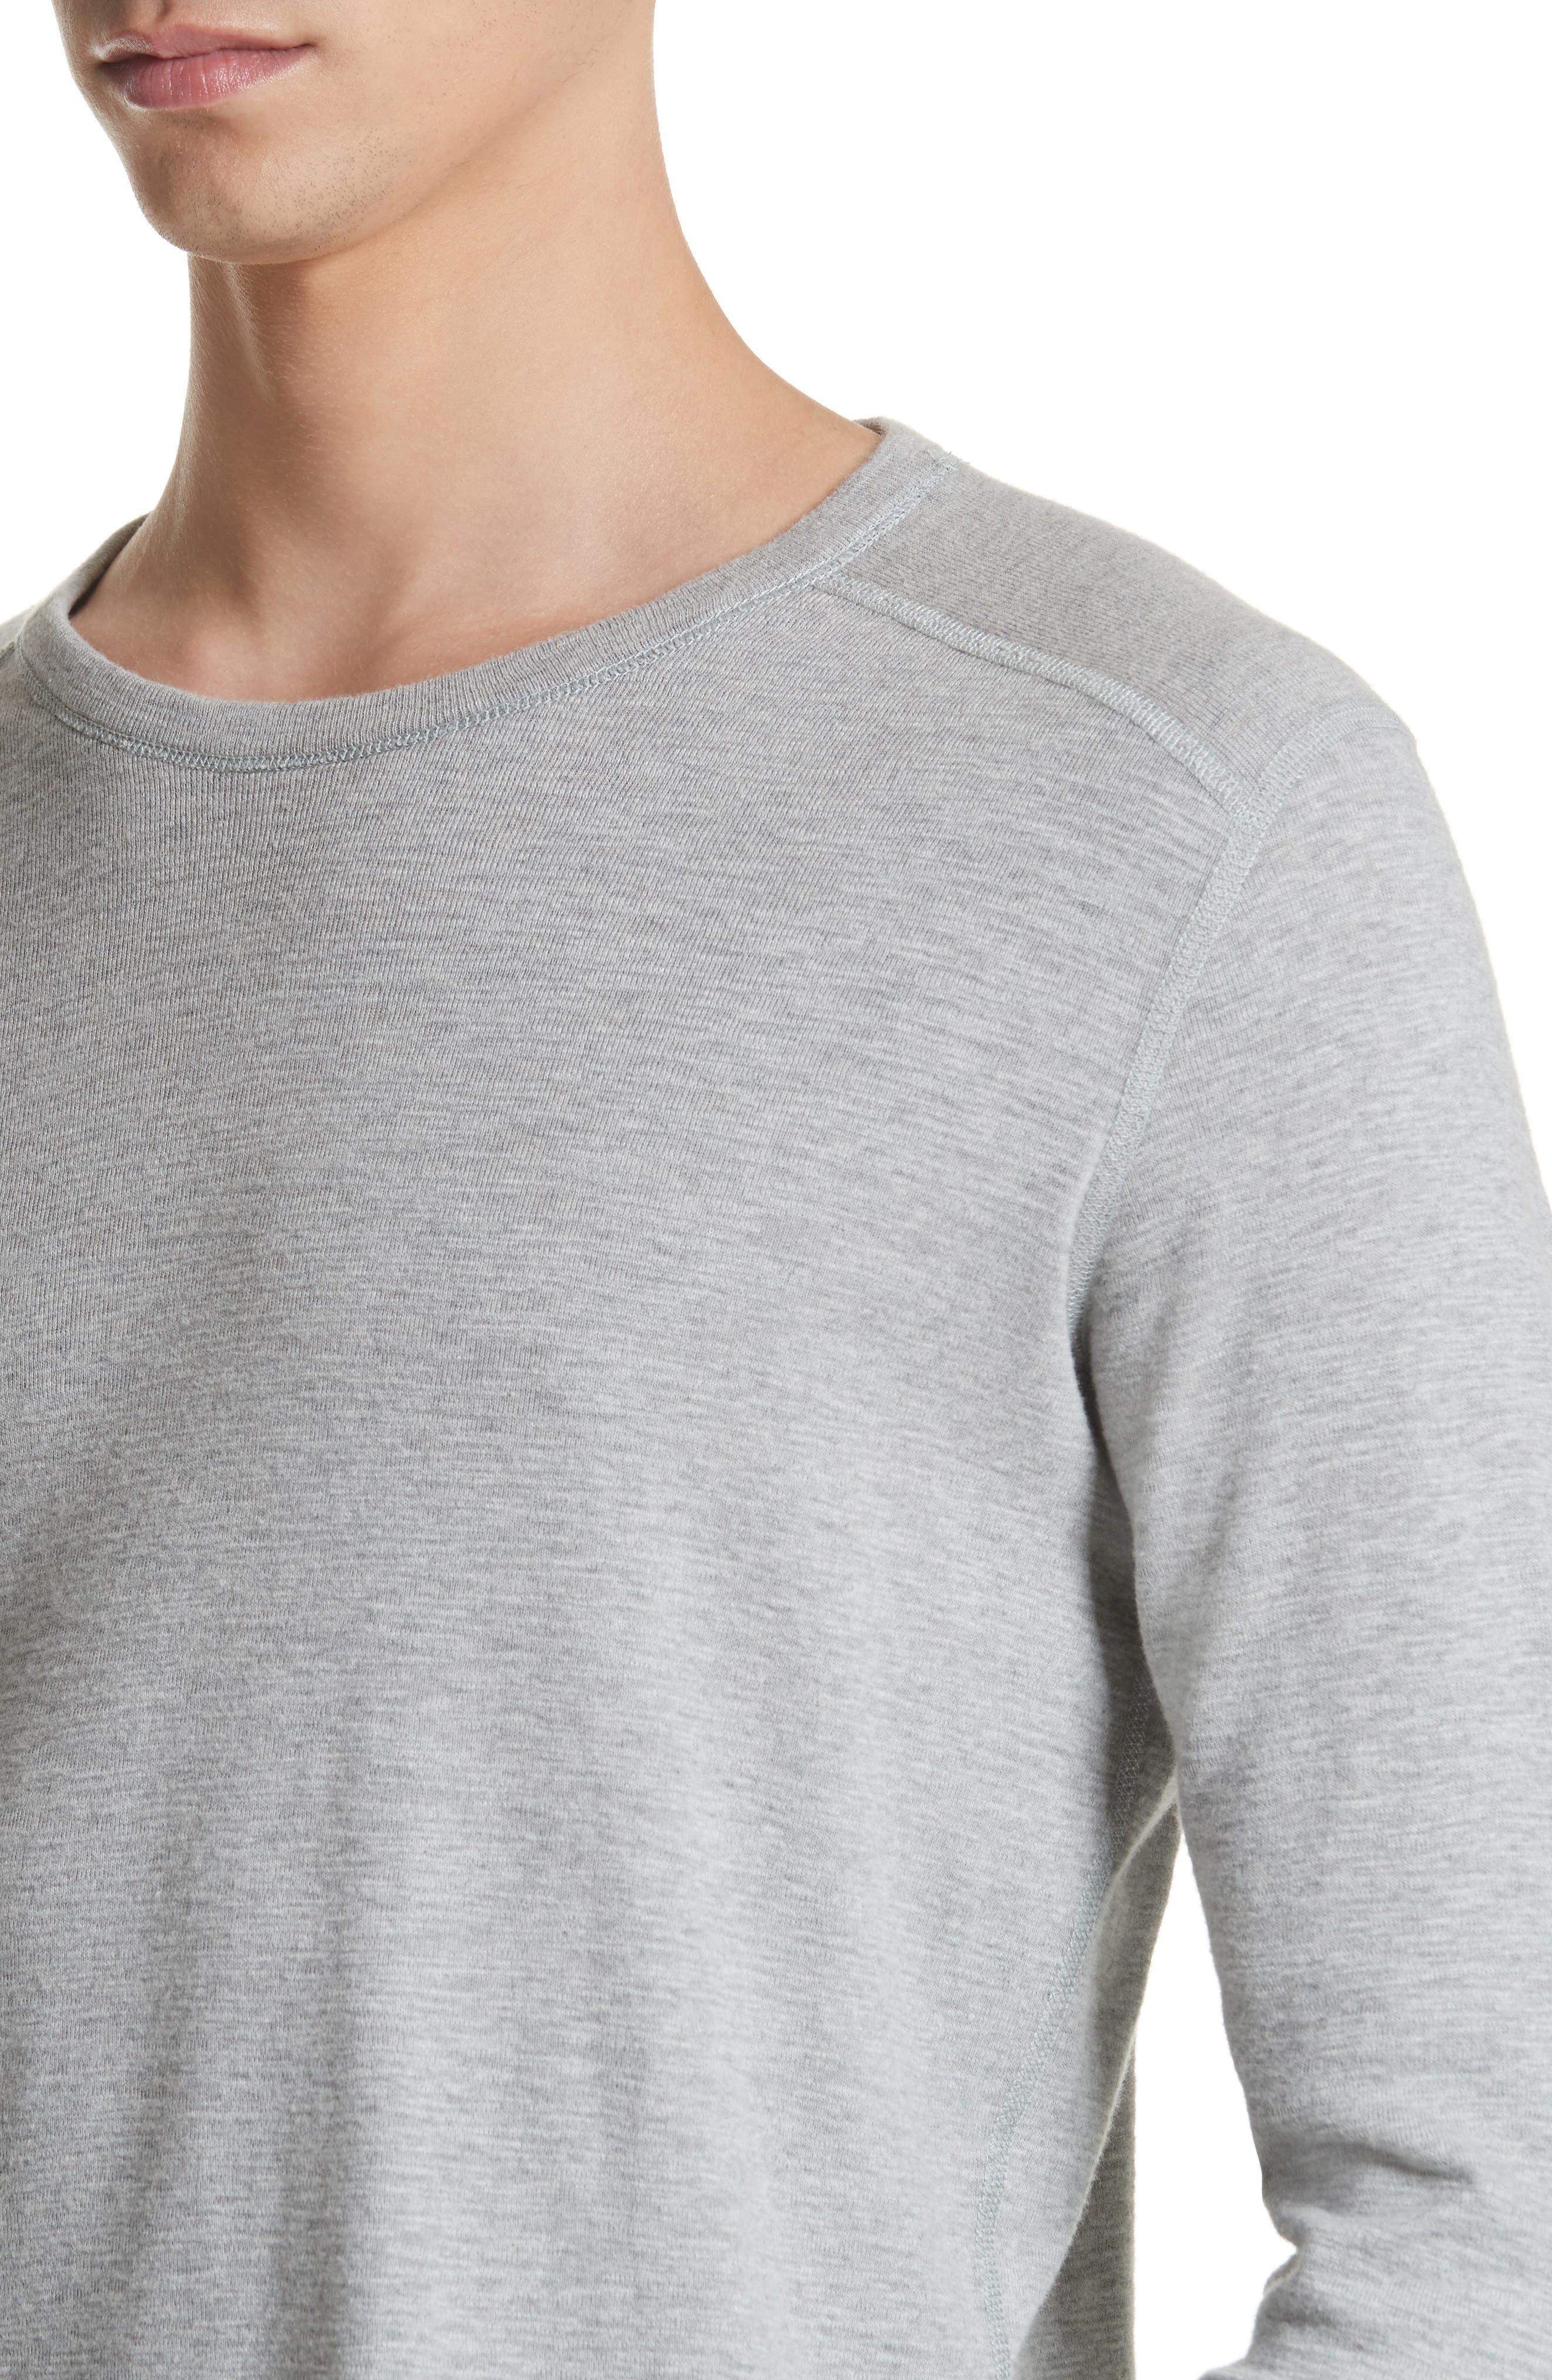 Slub Crewneck Sweater,                             Alternate thumbnail 4, color,                             HEATHER GREY